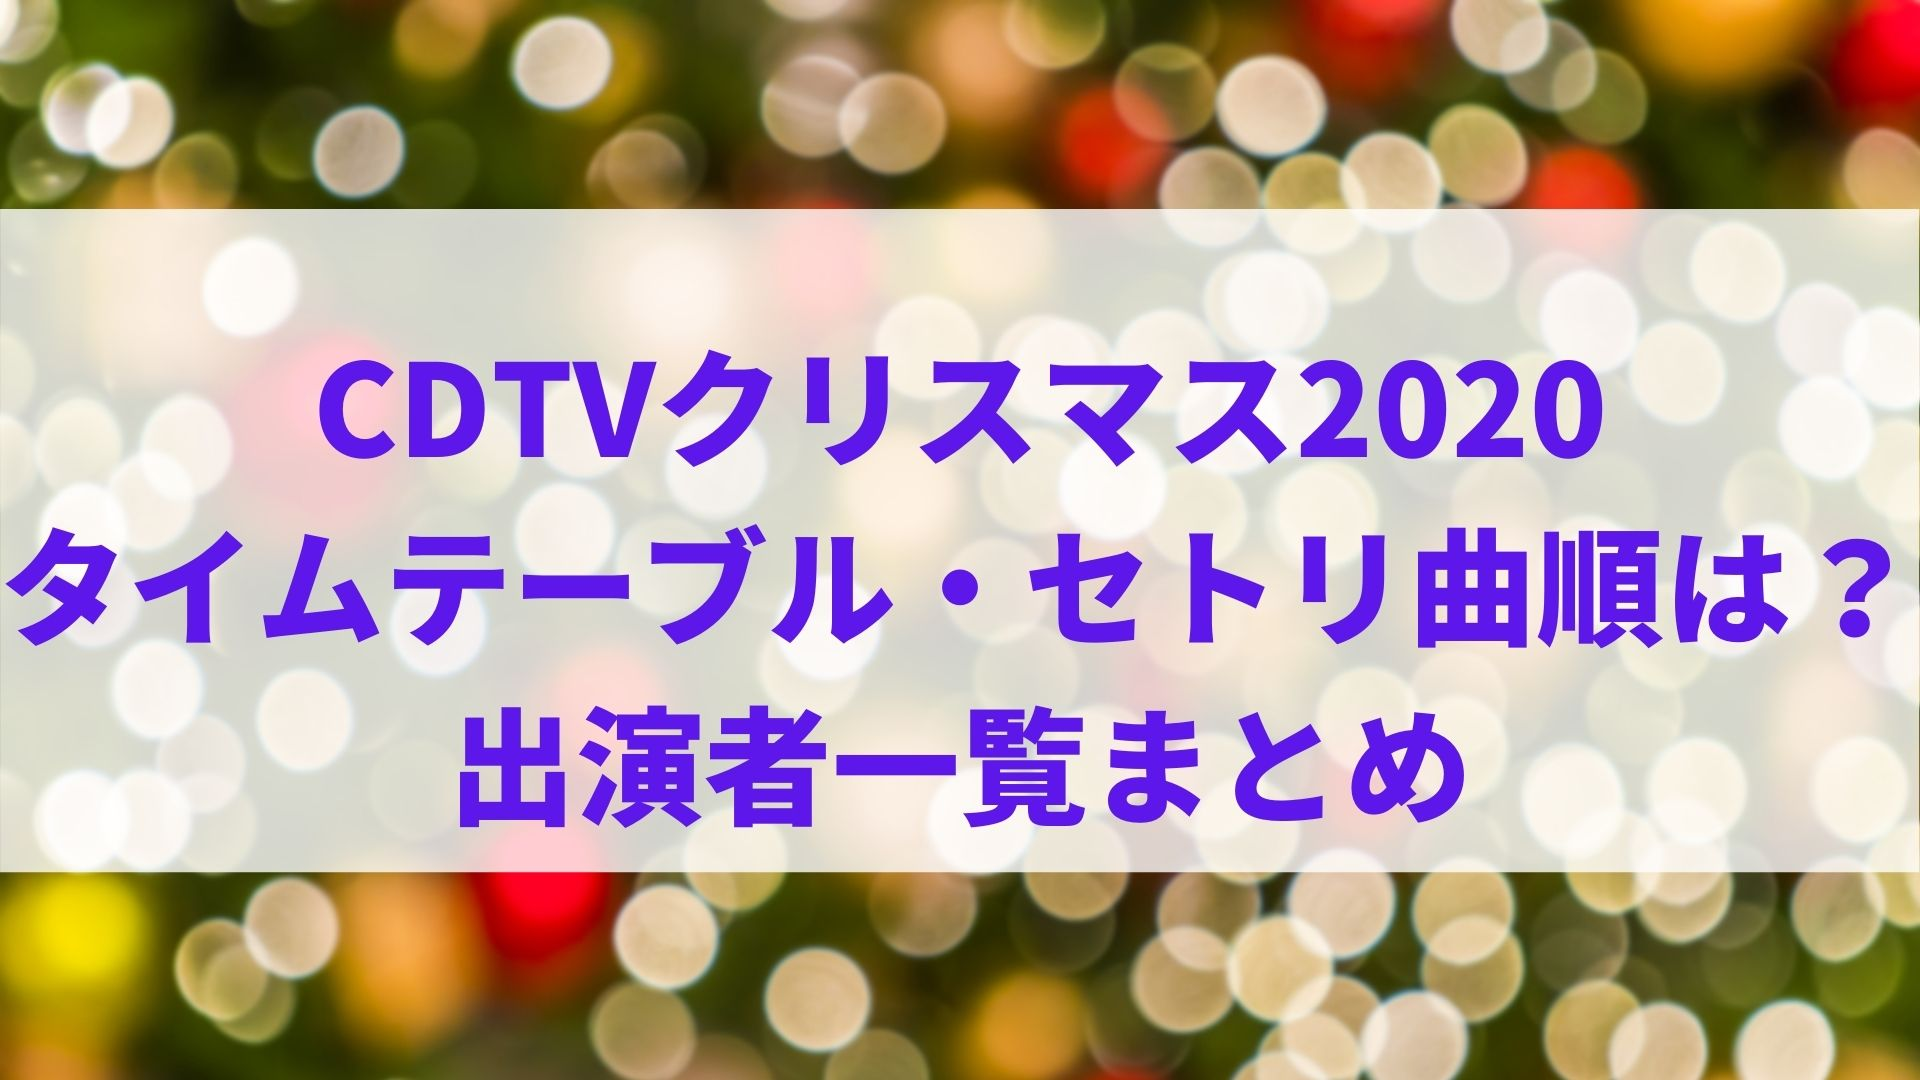 Tv 2020 カウントダウン